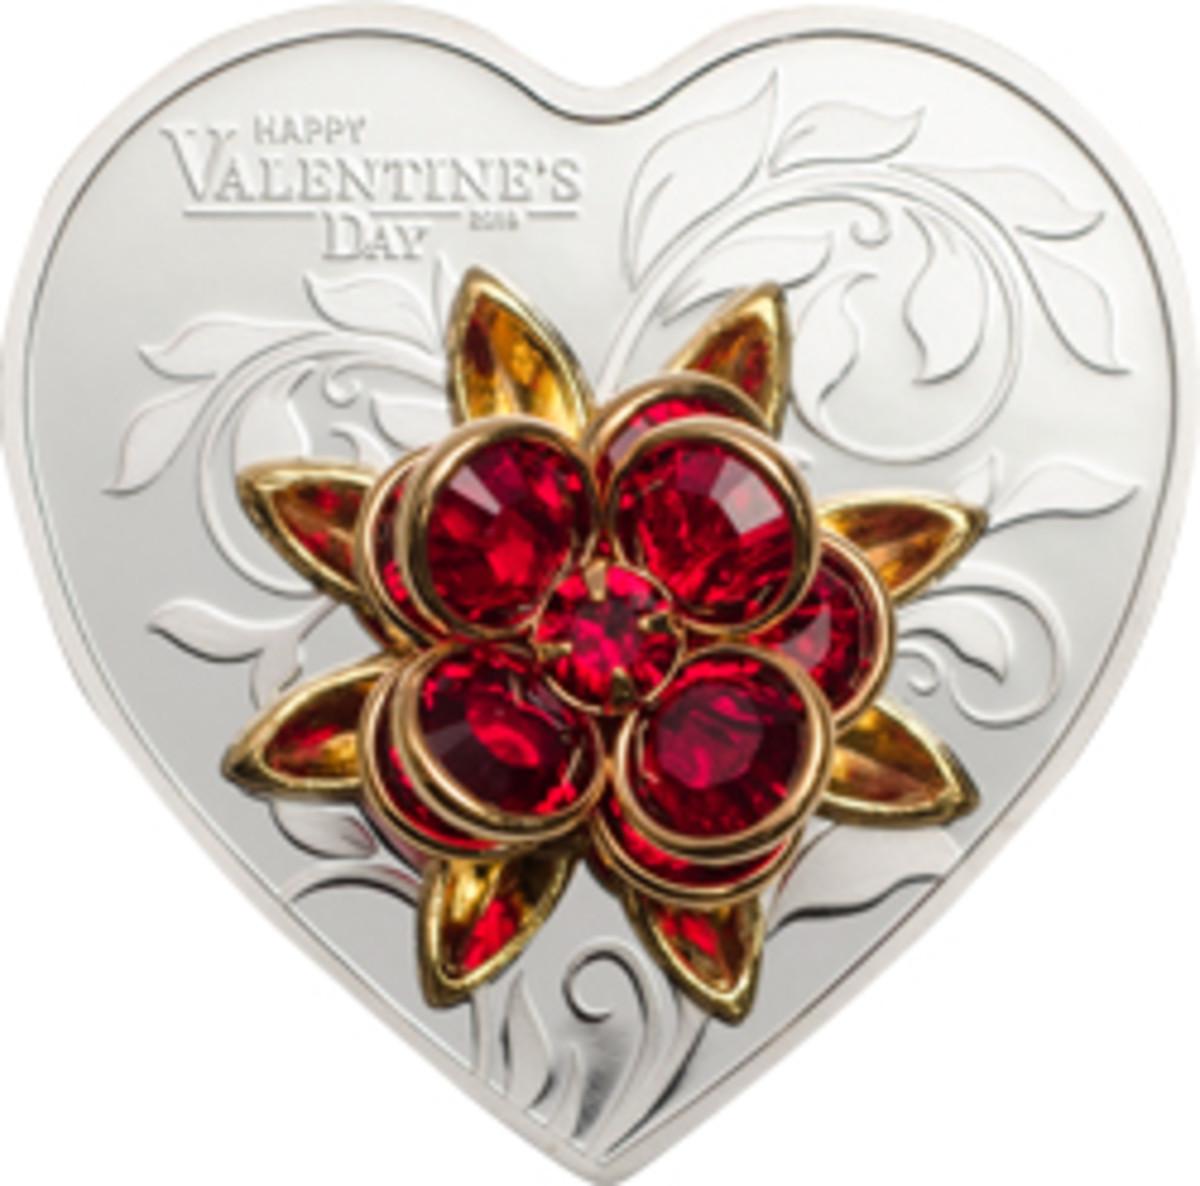 A red rose of SWAROVSKI® crystals celebrates Valentine's Day.